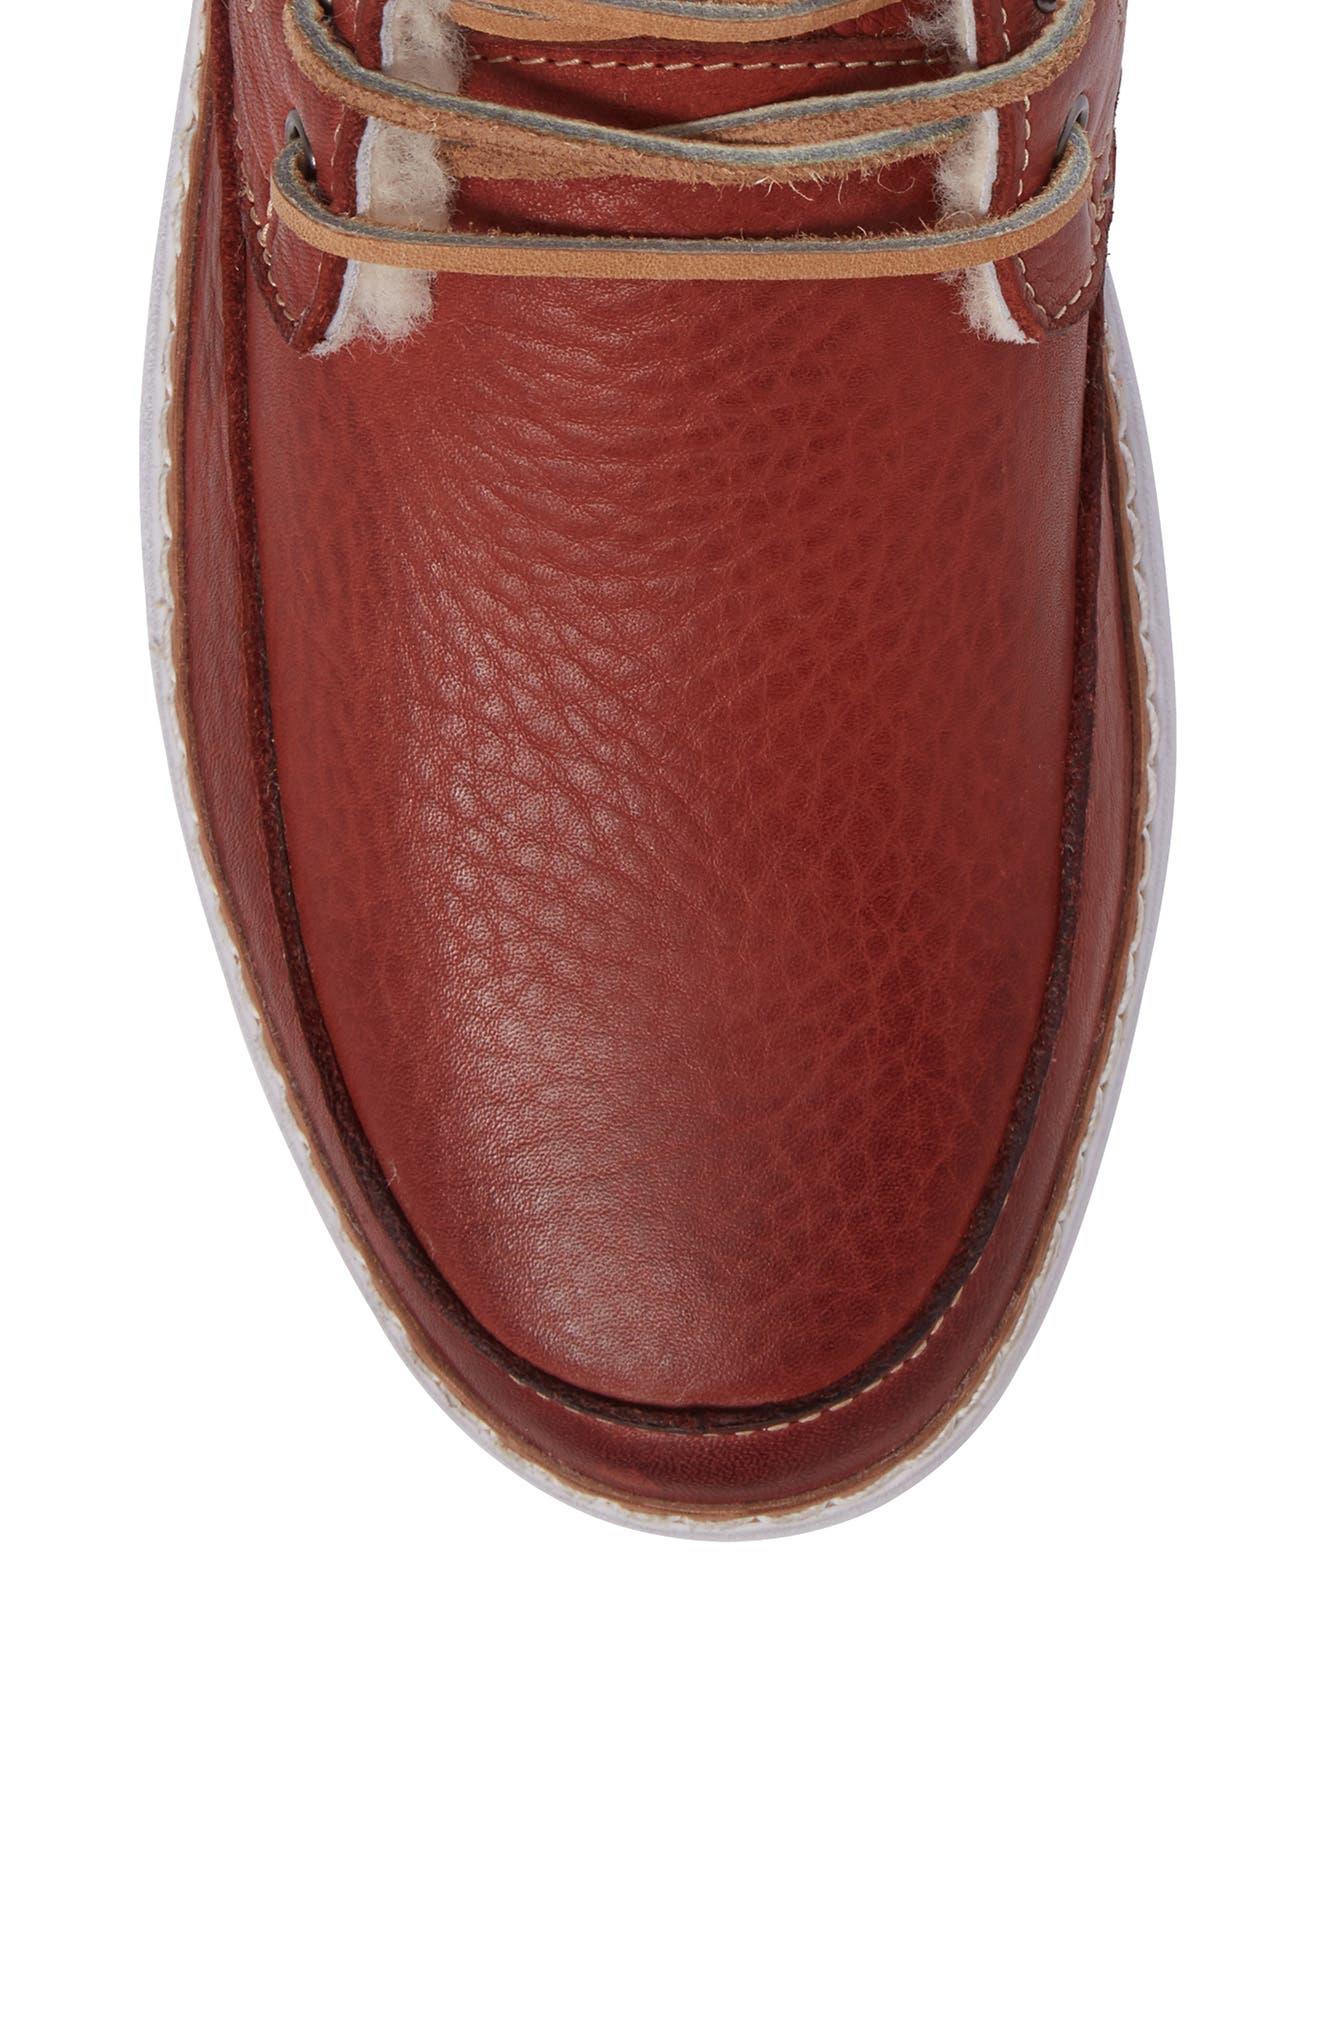 BLACKSTONE,                             'AM 32' Shearling Lined Boot,                             Alternate thumbnail 5, color,                             200